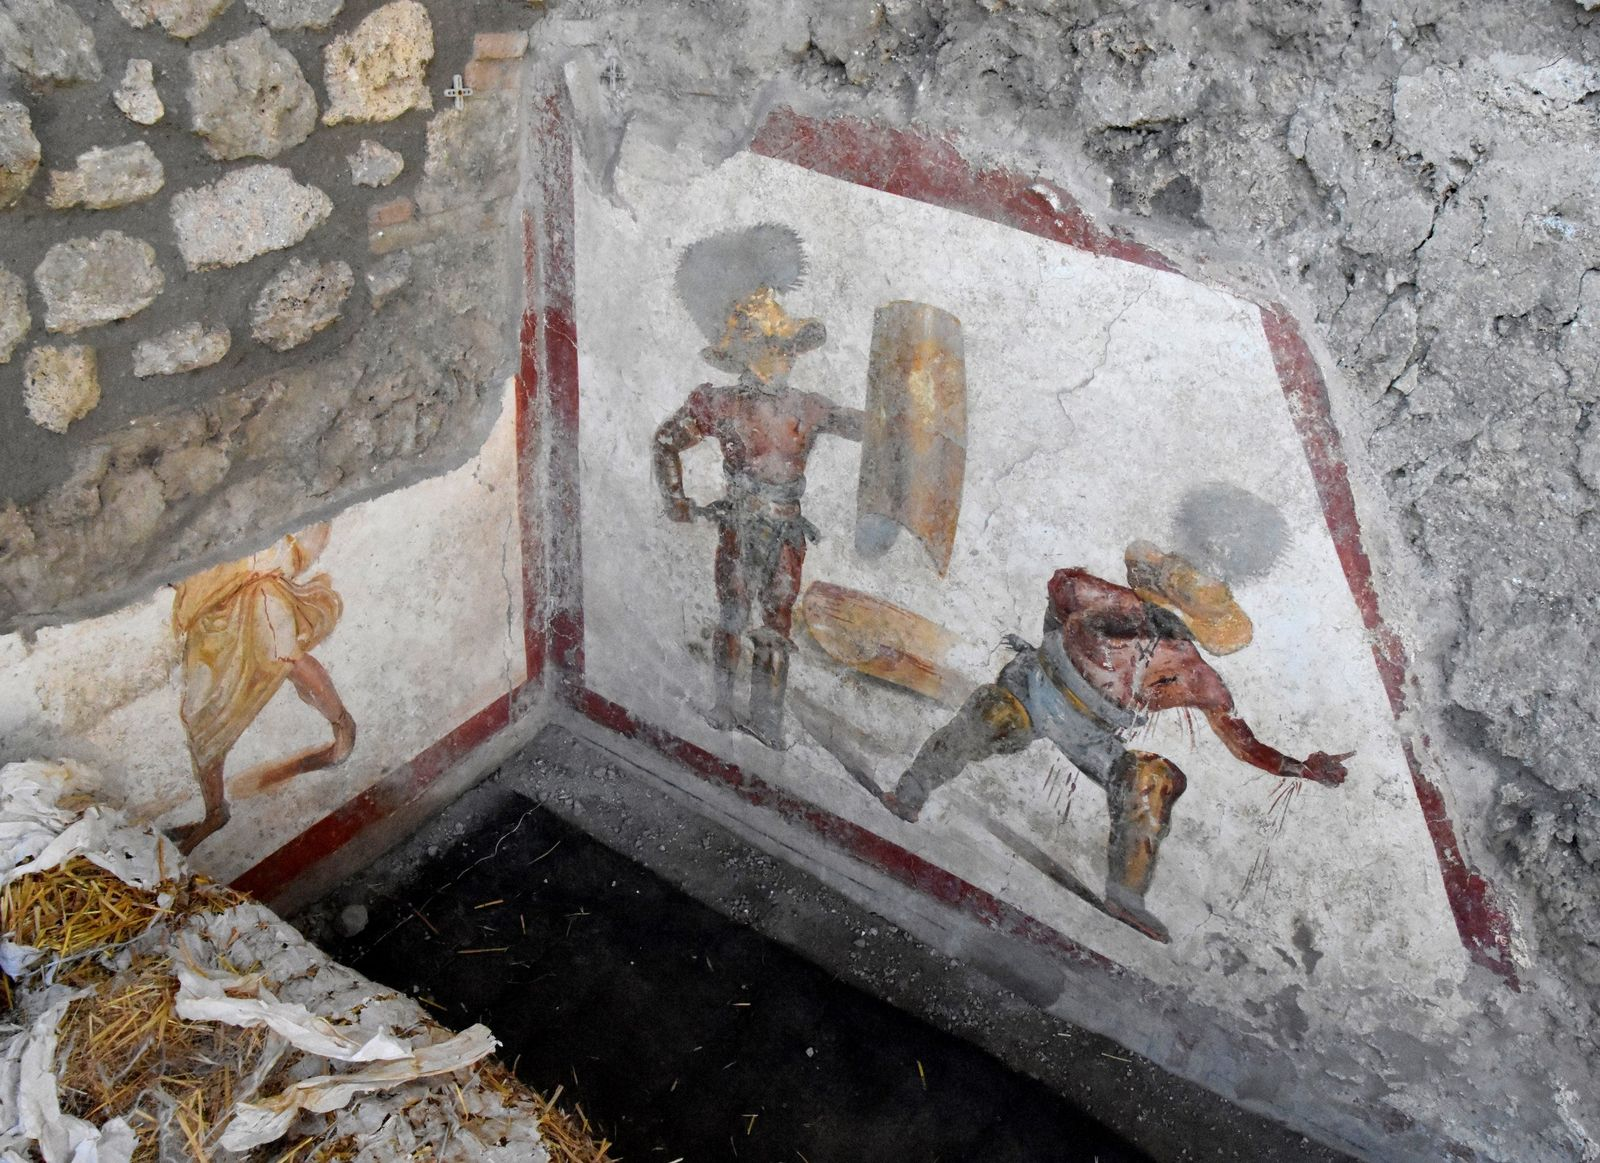 Gladiatoren-Fresko in Pompeji entdeckt